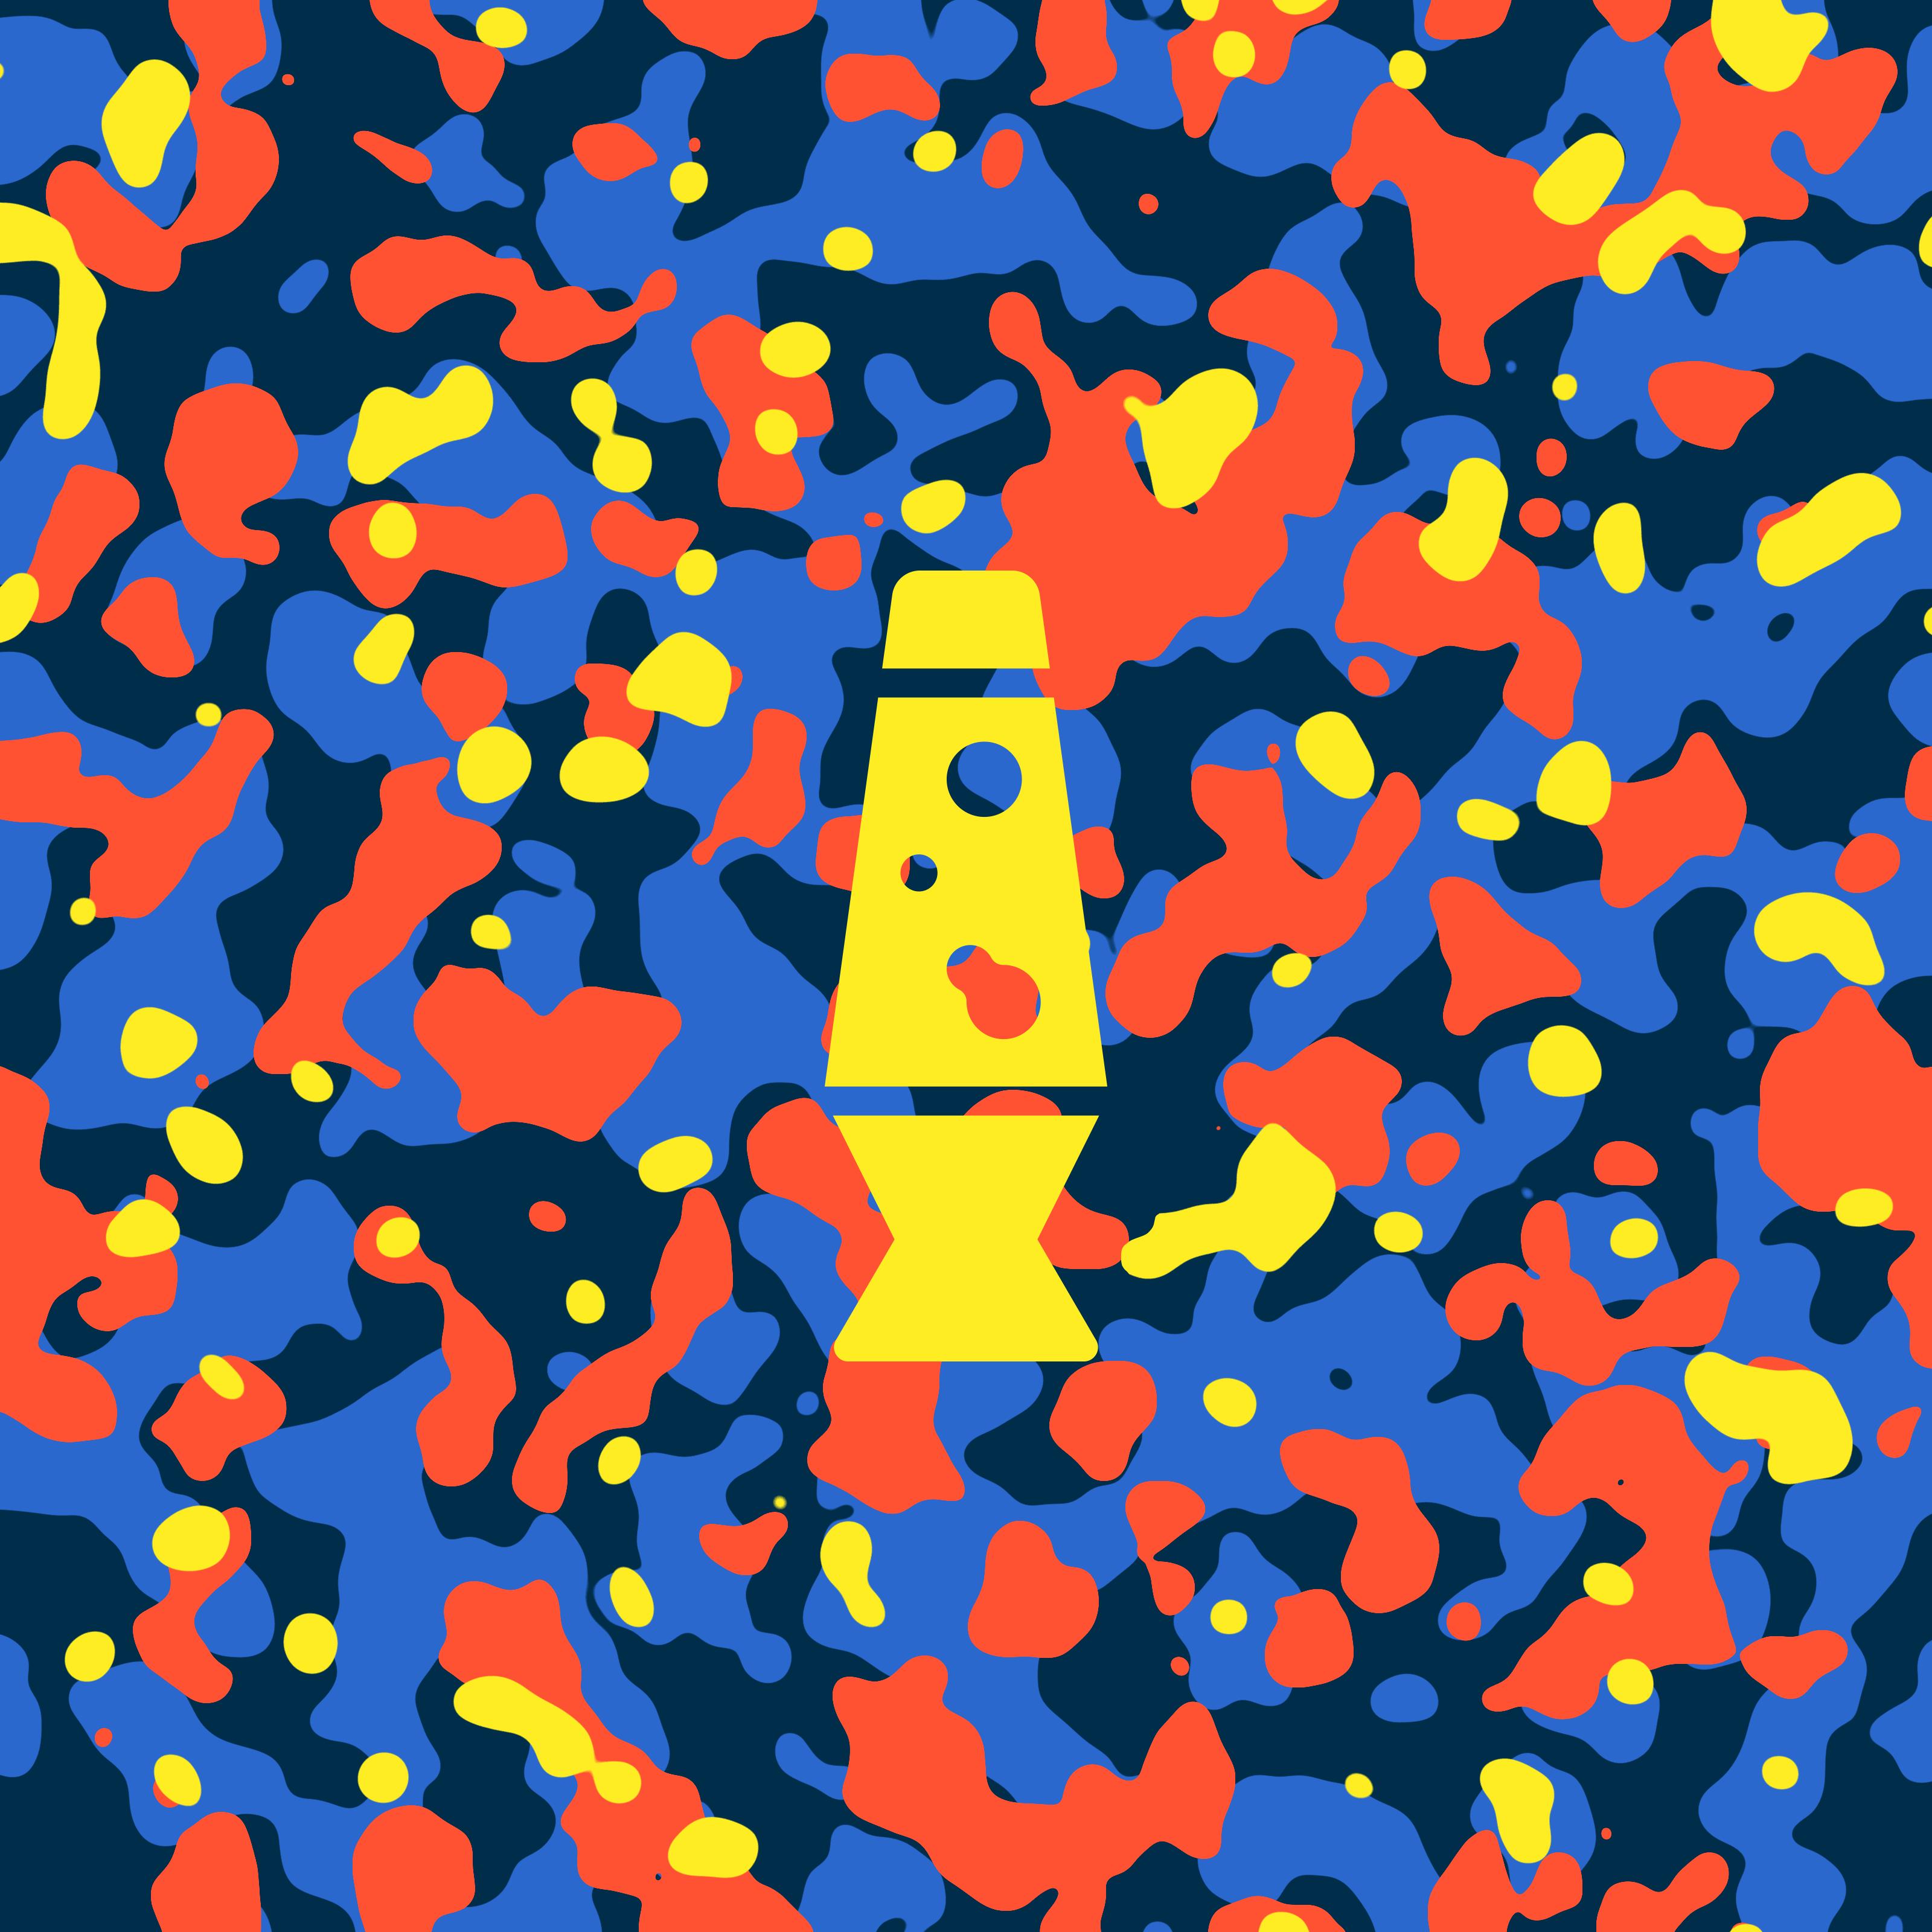 Lava lamp camouflage